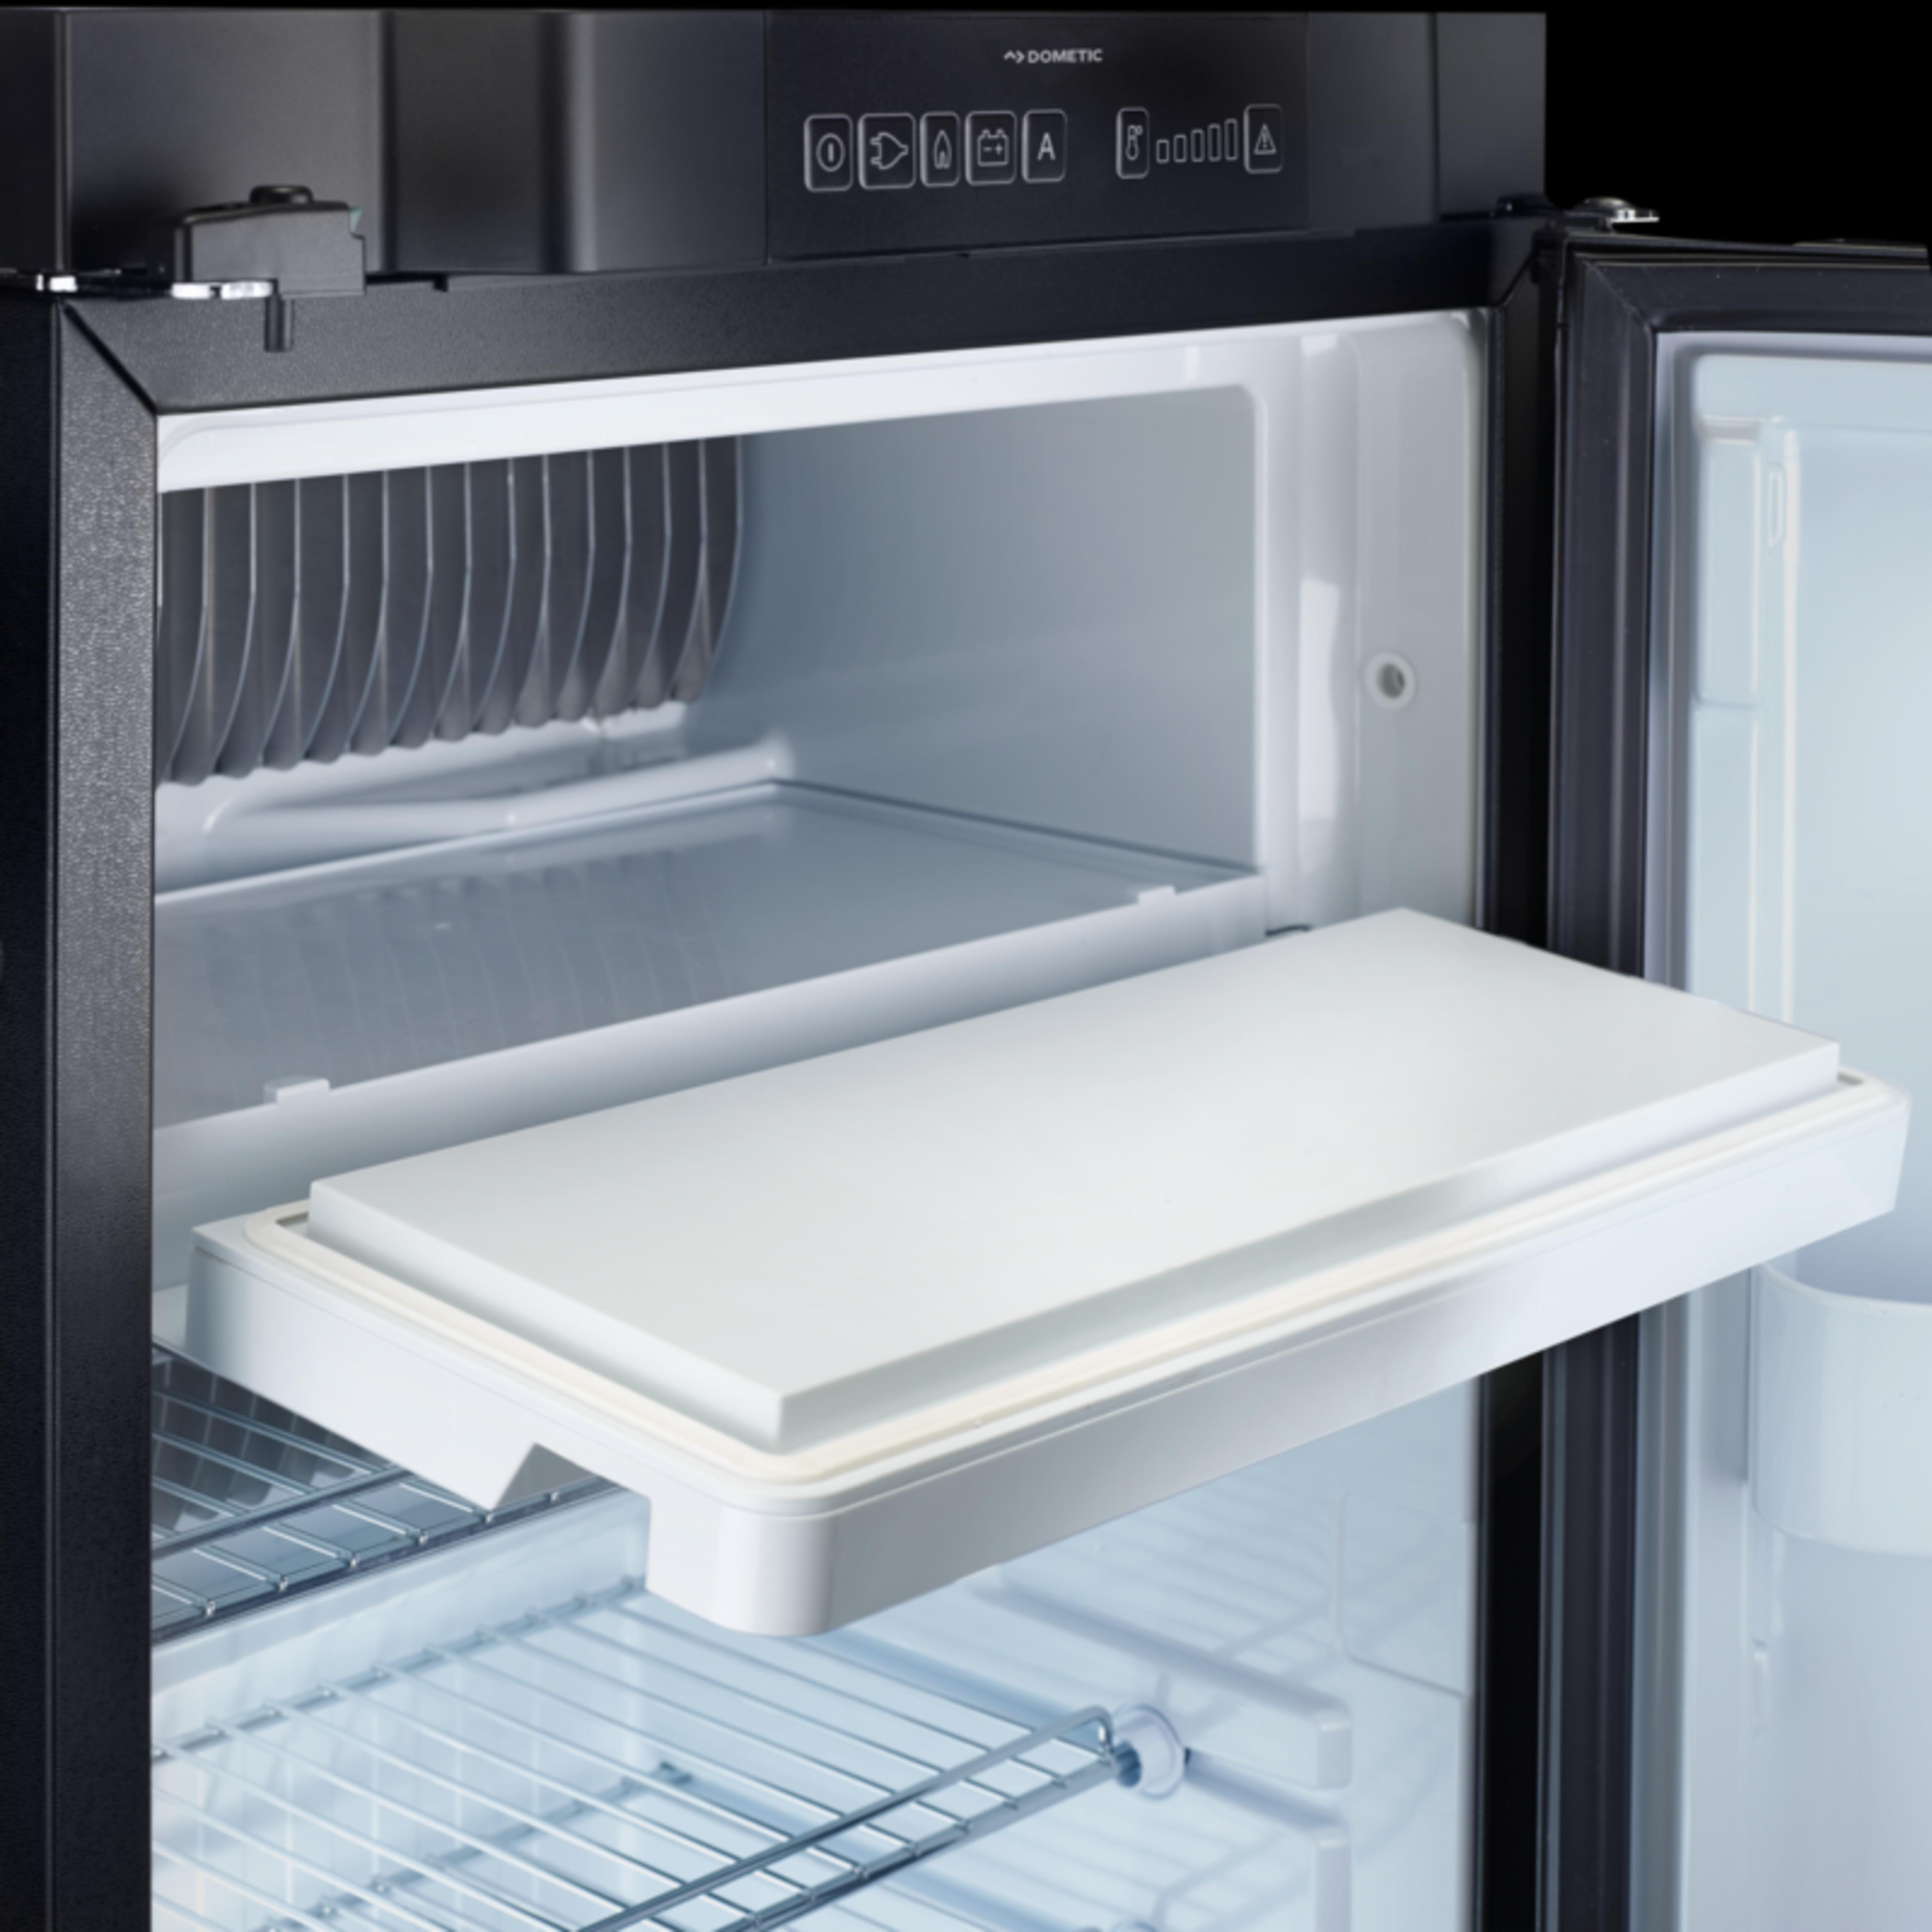 Removable freezer compartment